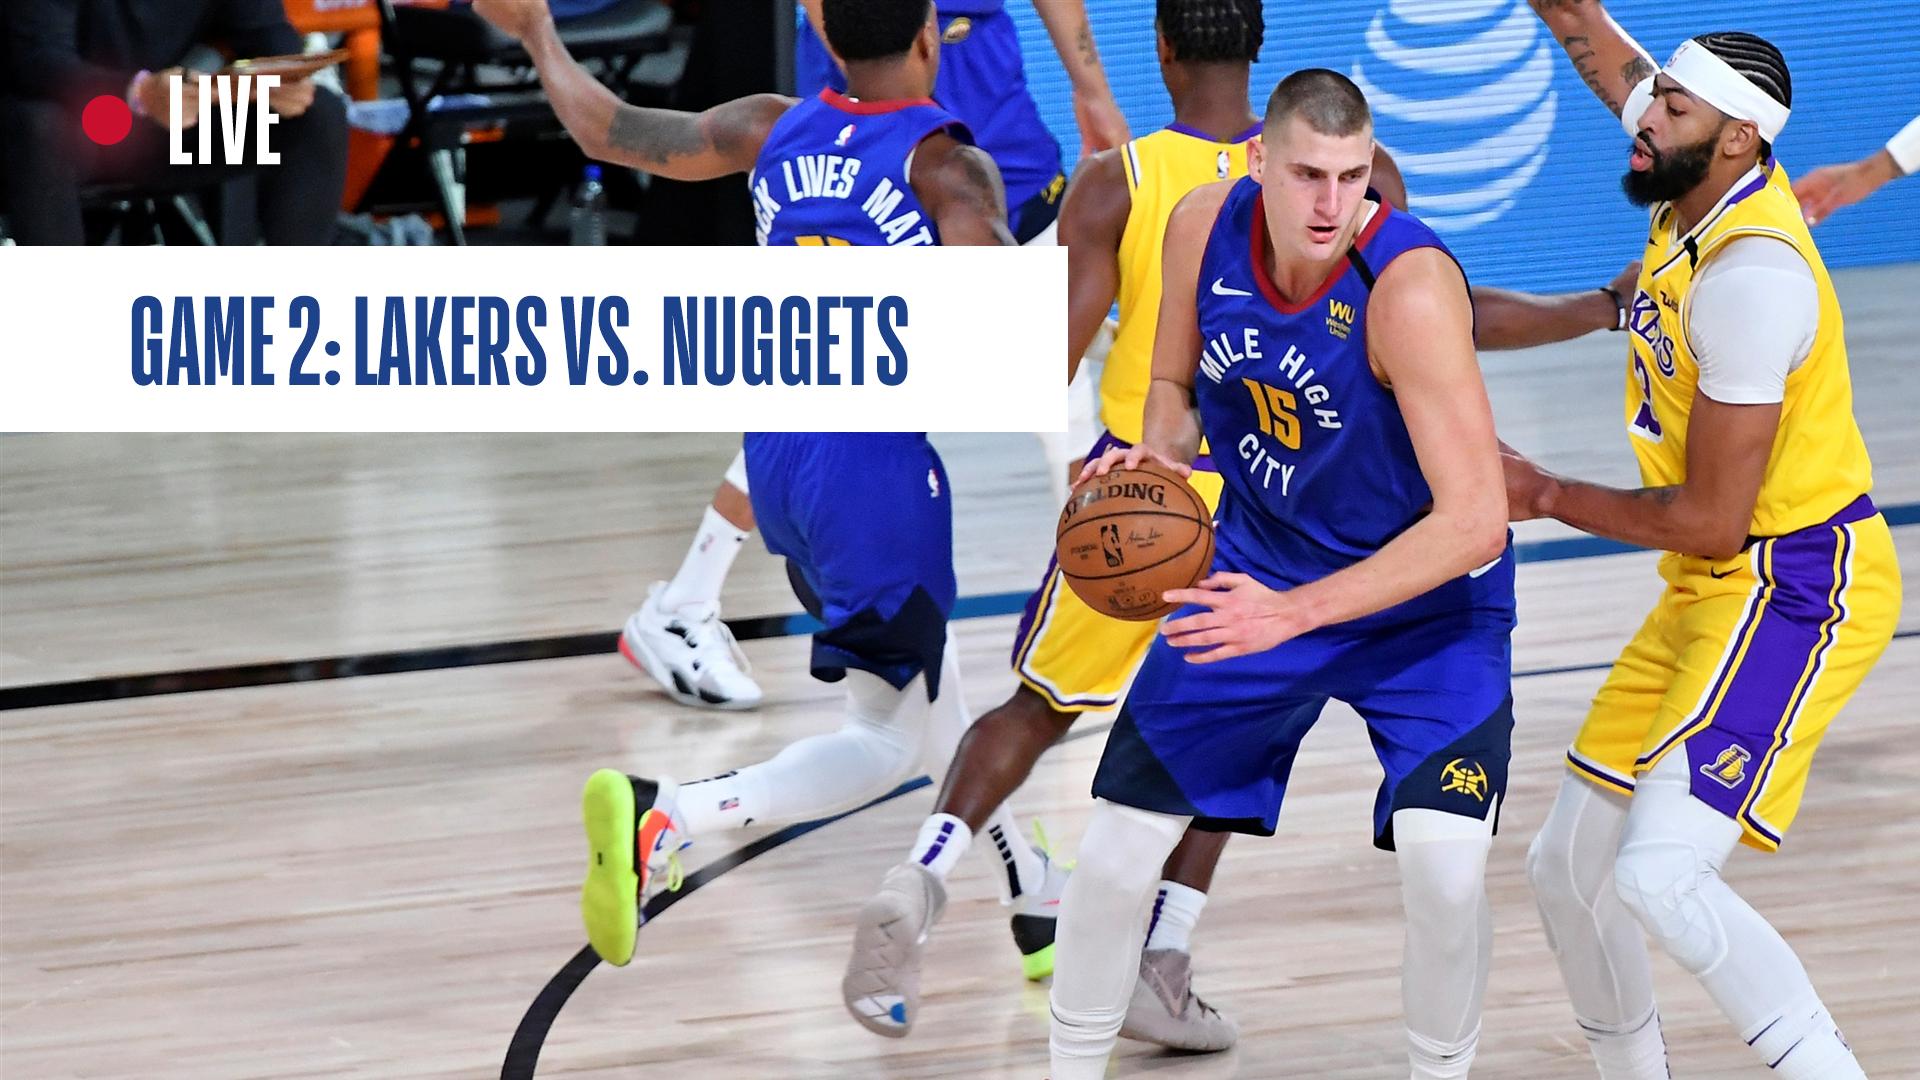 Los Angeles Lakers vs. Denver Nuggets Game 2: Live score ...